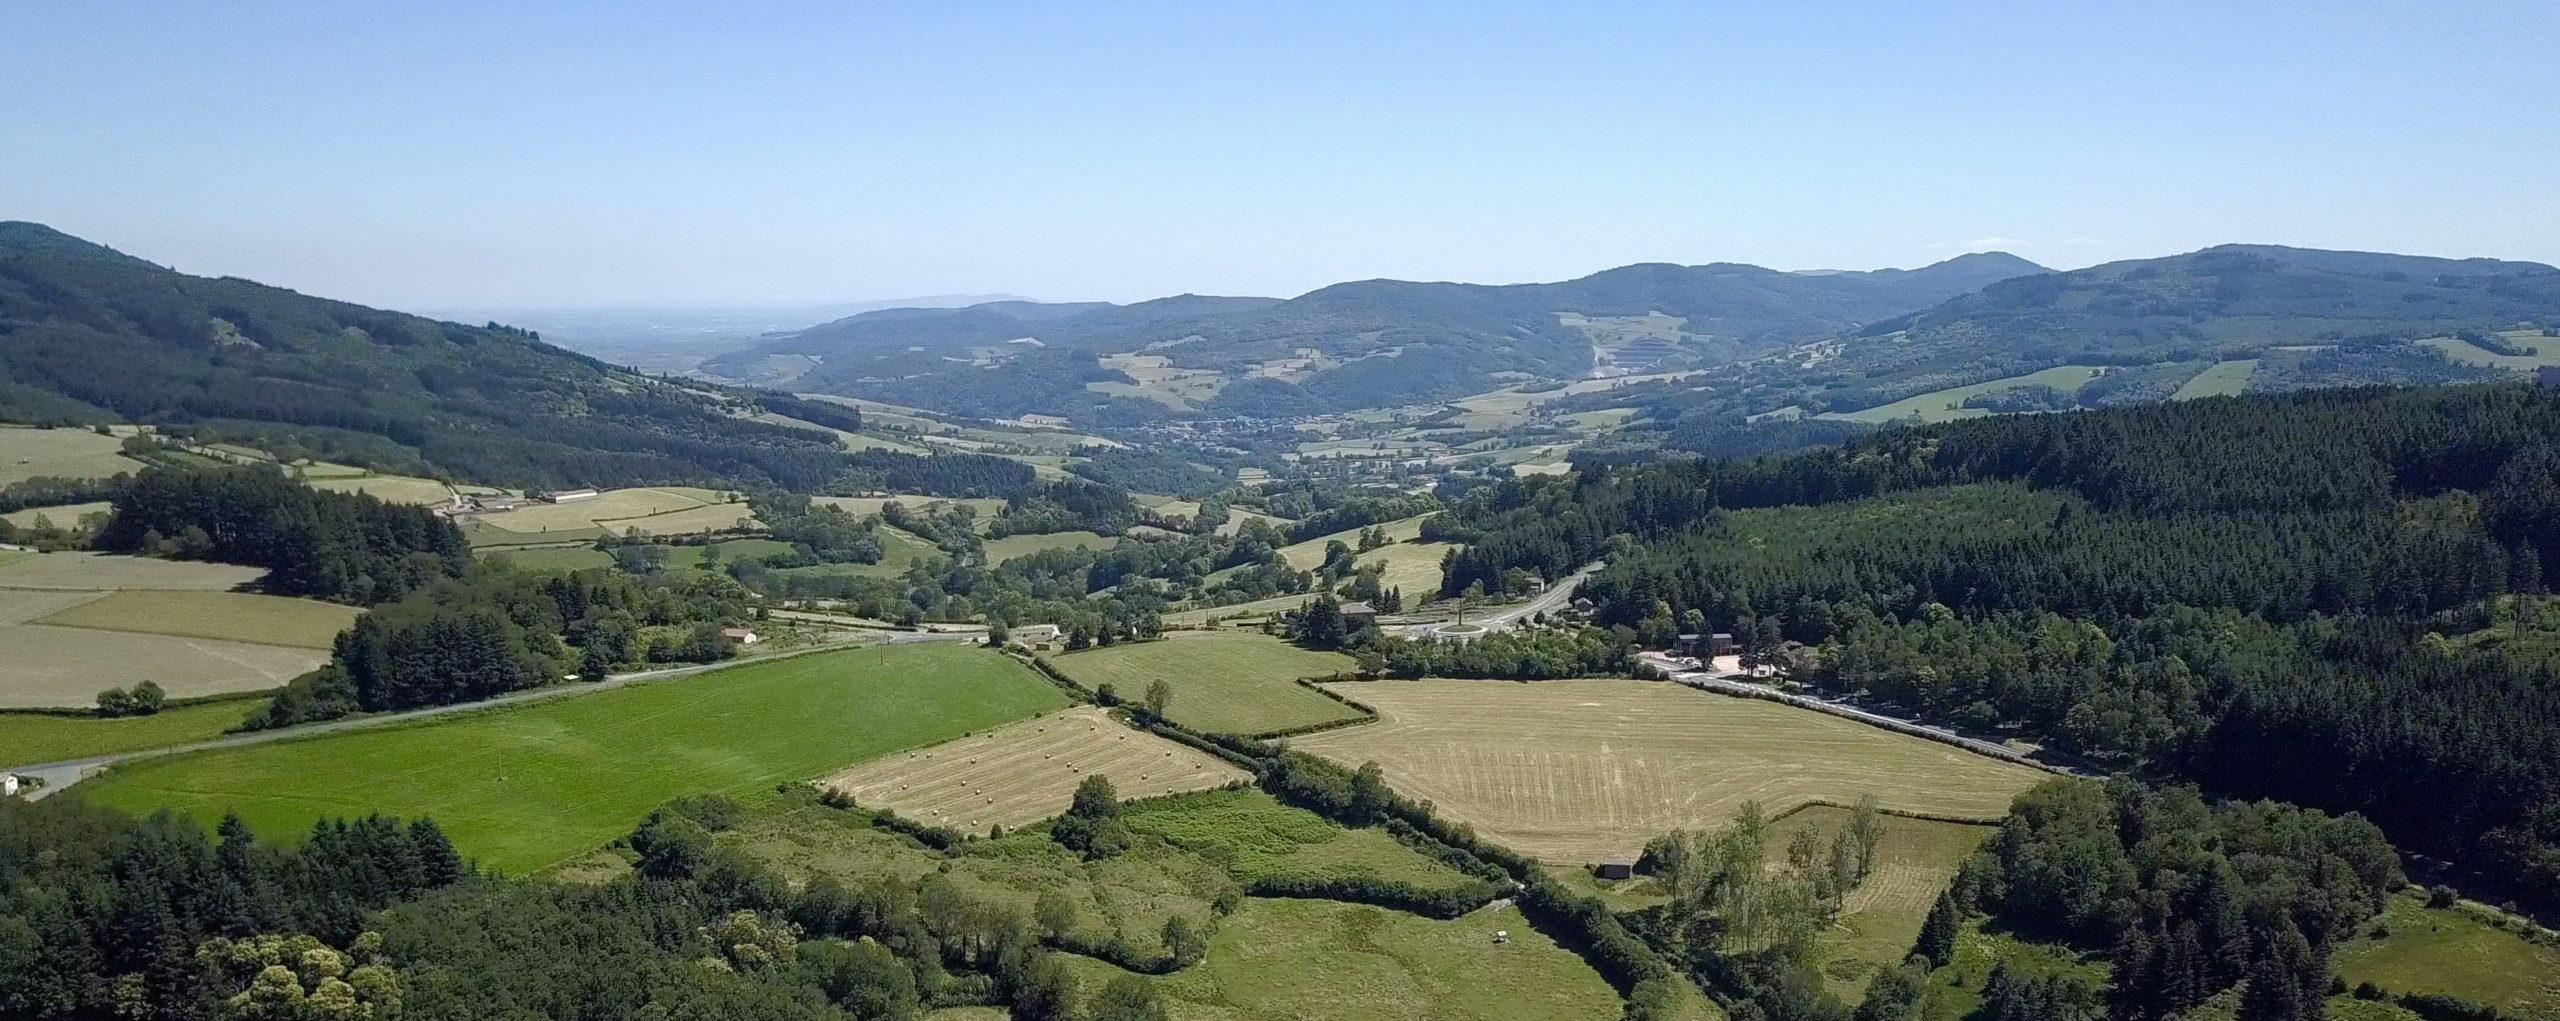 Panorama-Haut-Beaujolais-2-1-scaled